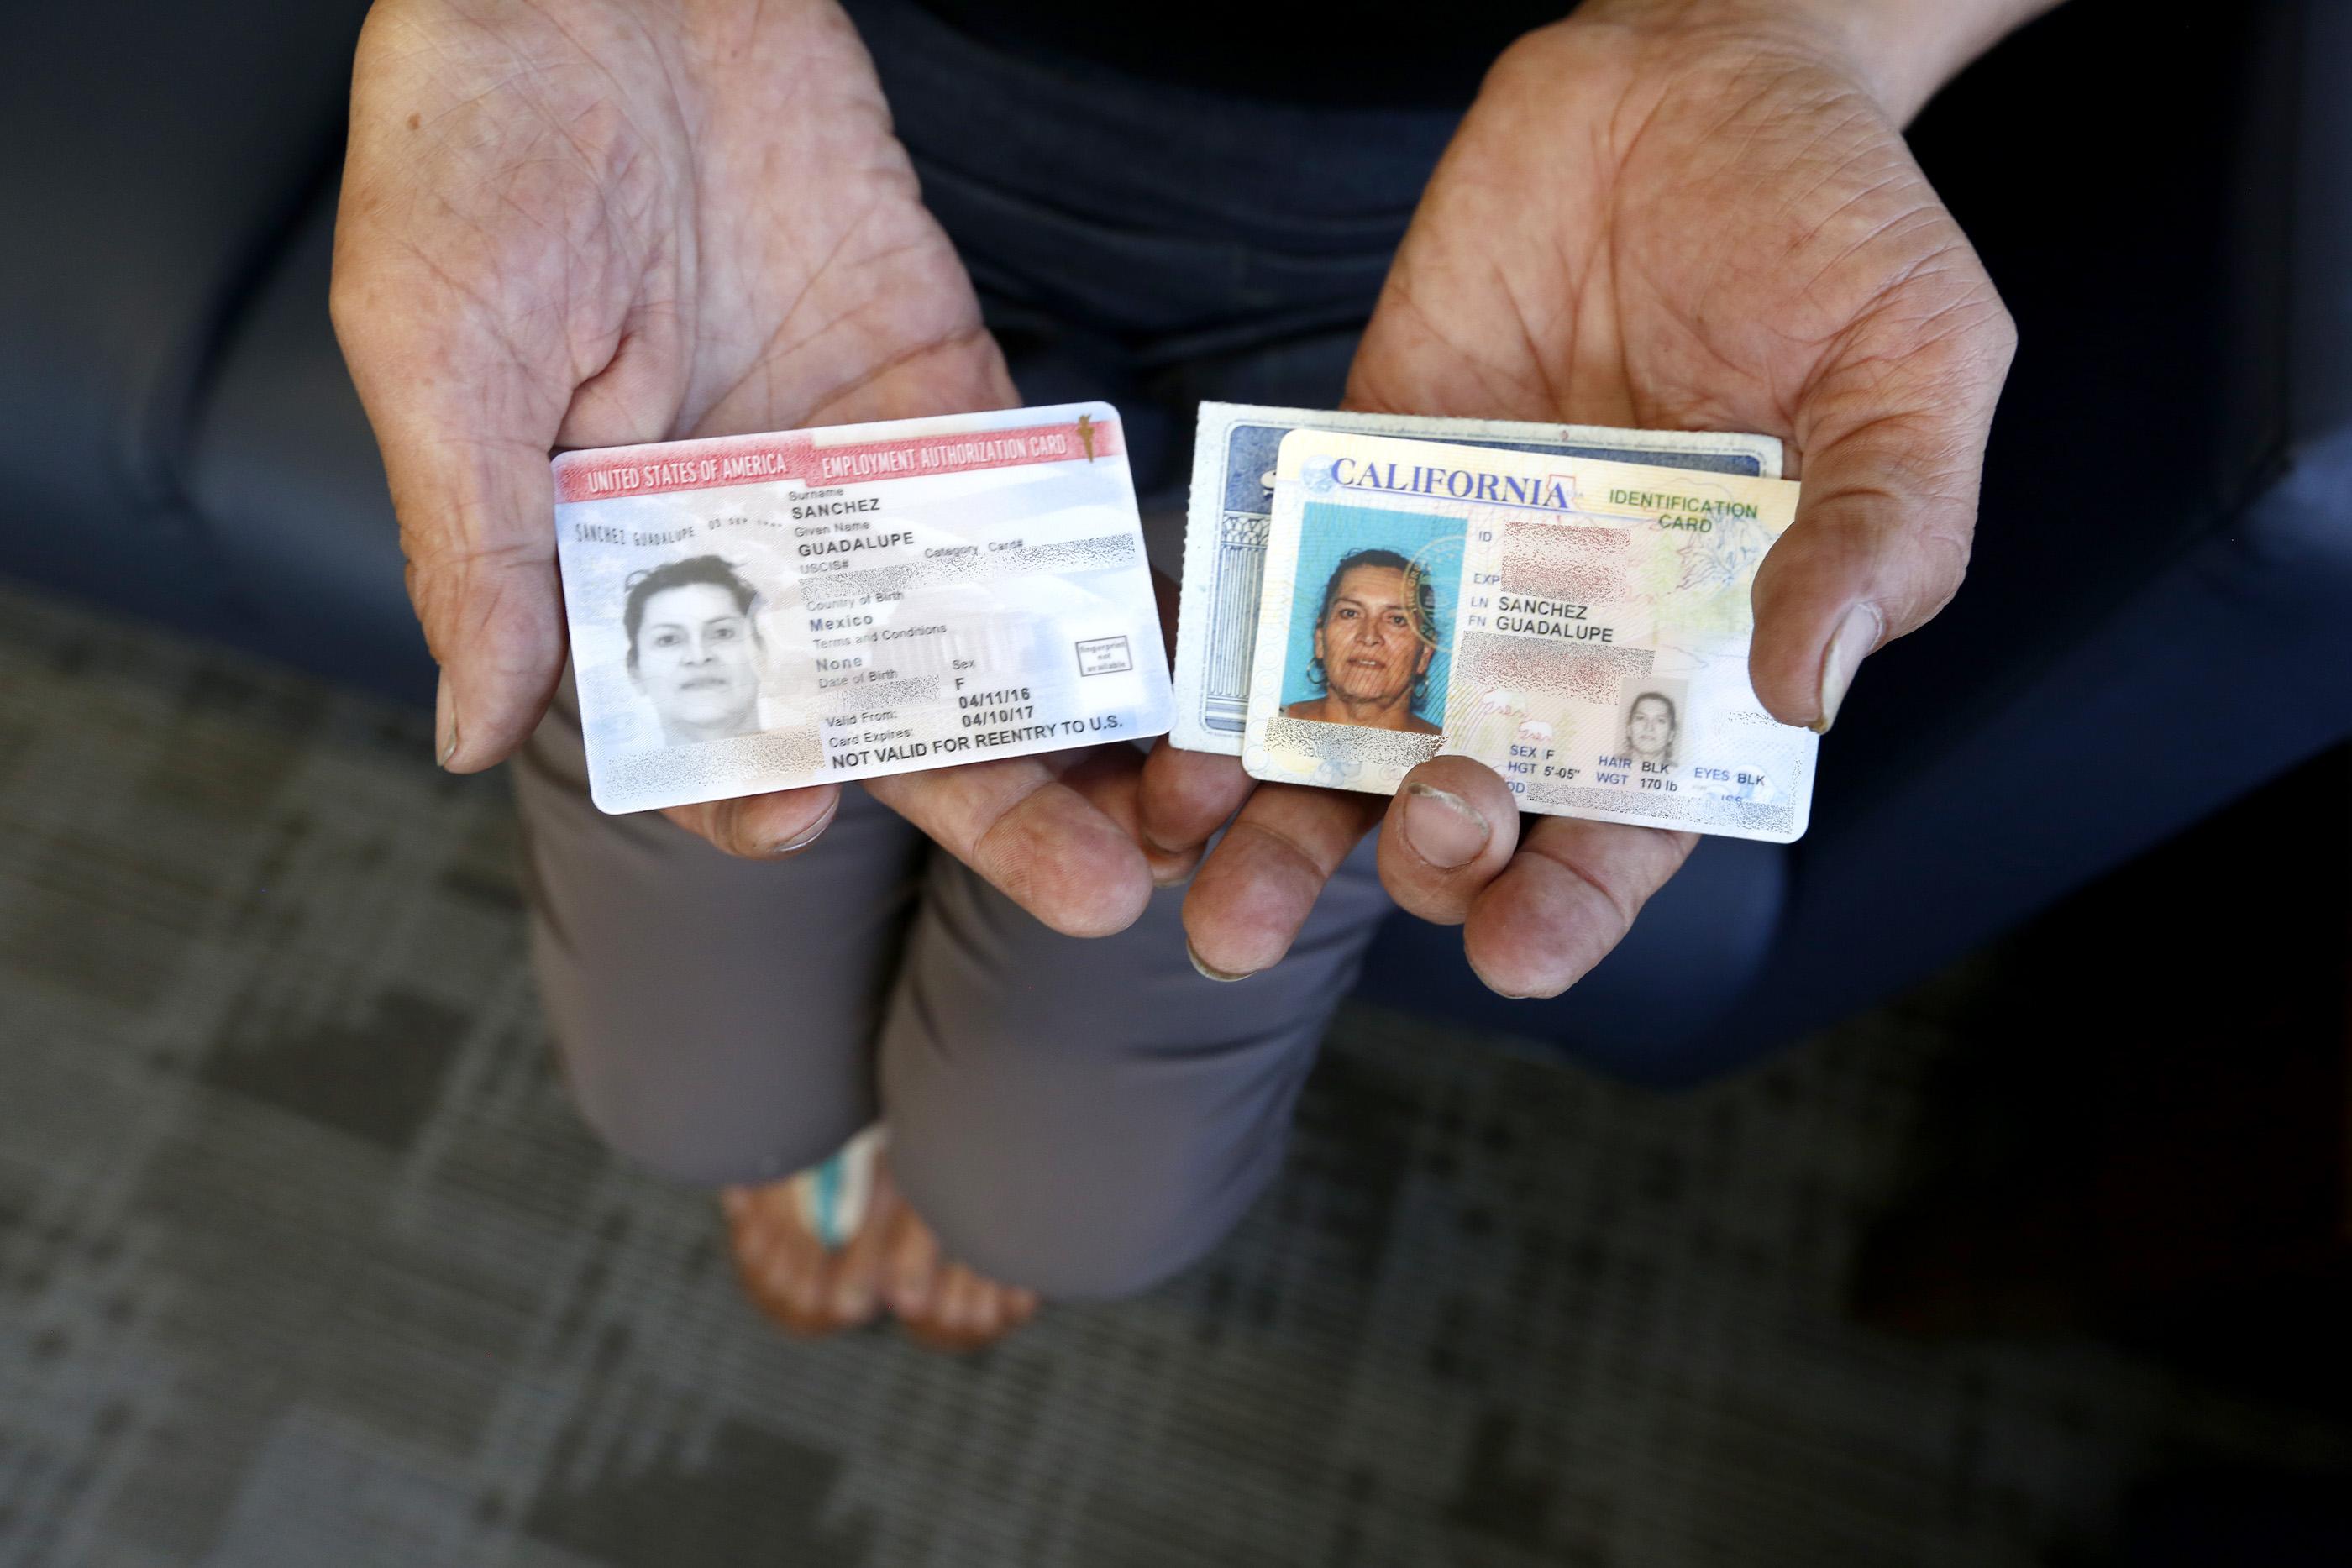 09/21/16/ LOS ANGELES/Transgendered woman Guadalupe Sanchez (Photo Aurelia Ventura/ La Opinion)